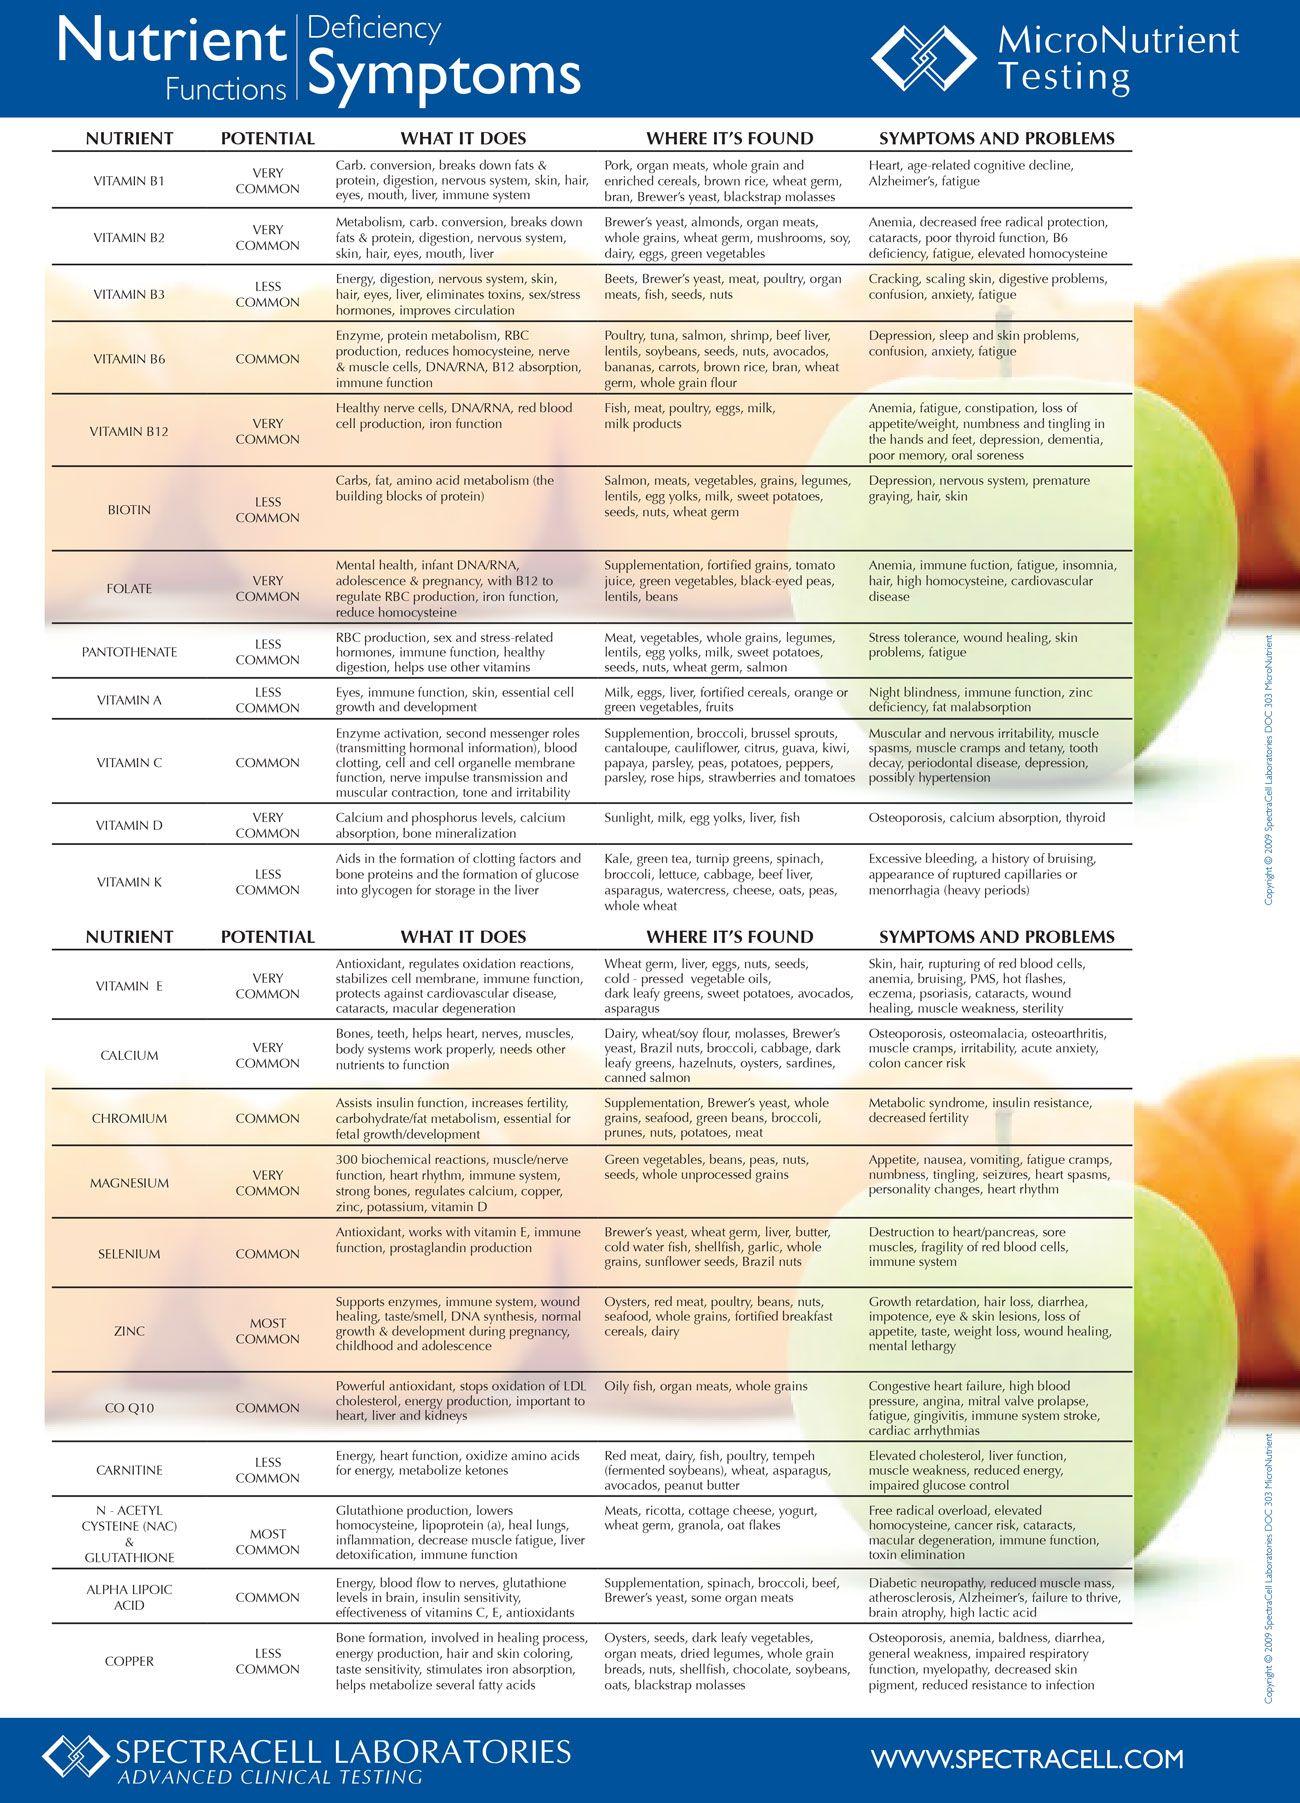 Vitamin Deficiency Symptoms Chart (PLUS INFOGRAPHIC